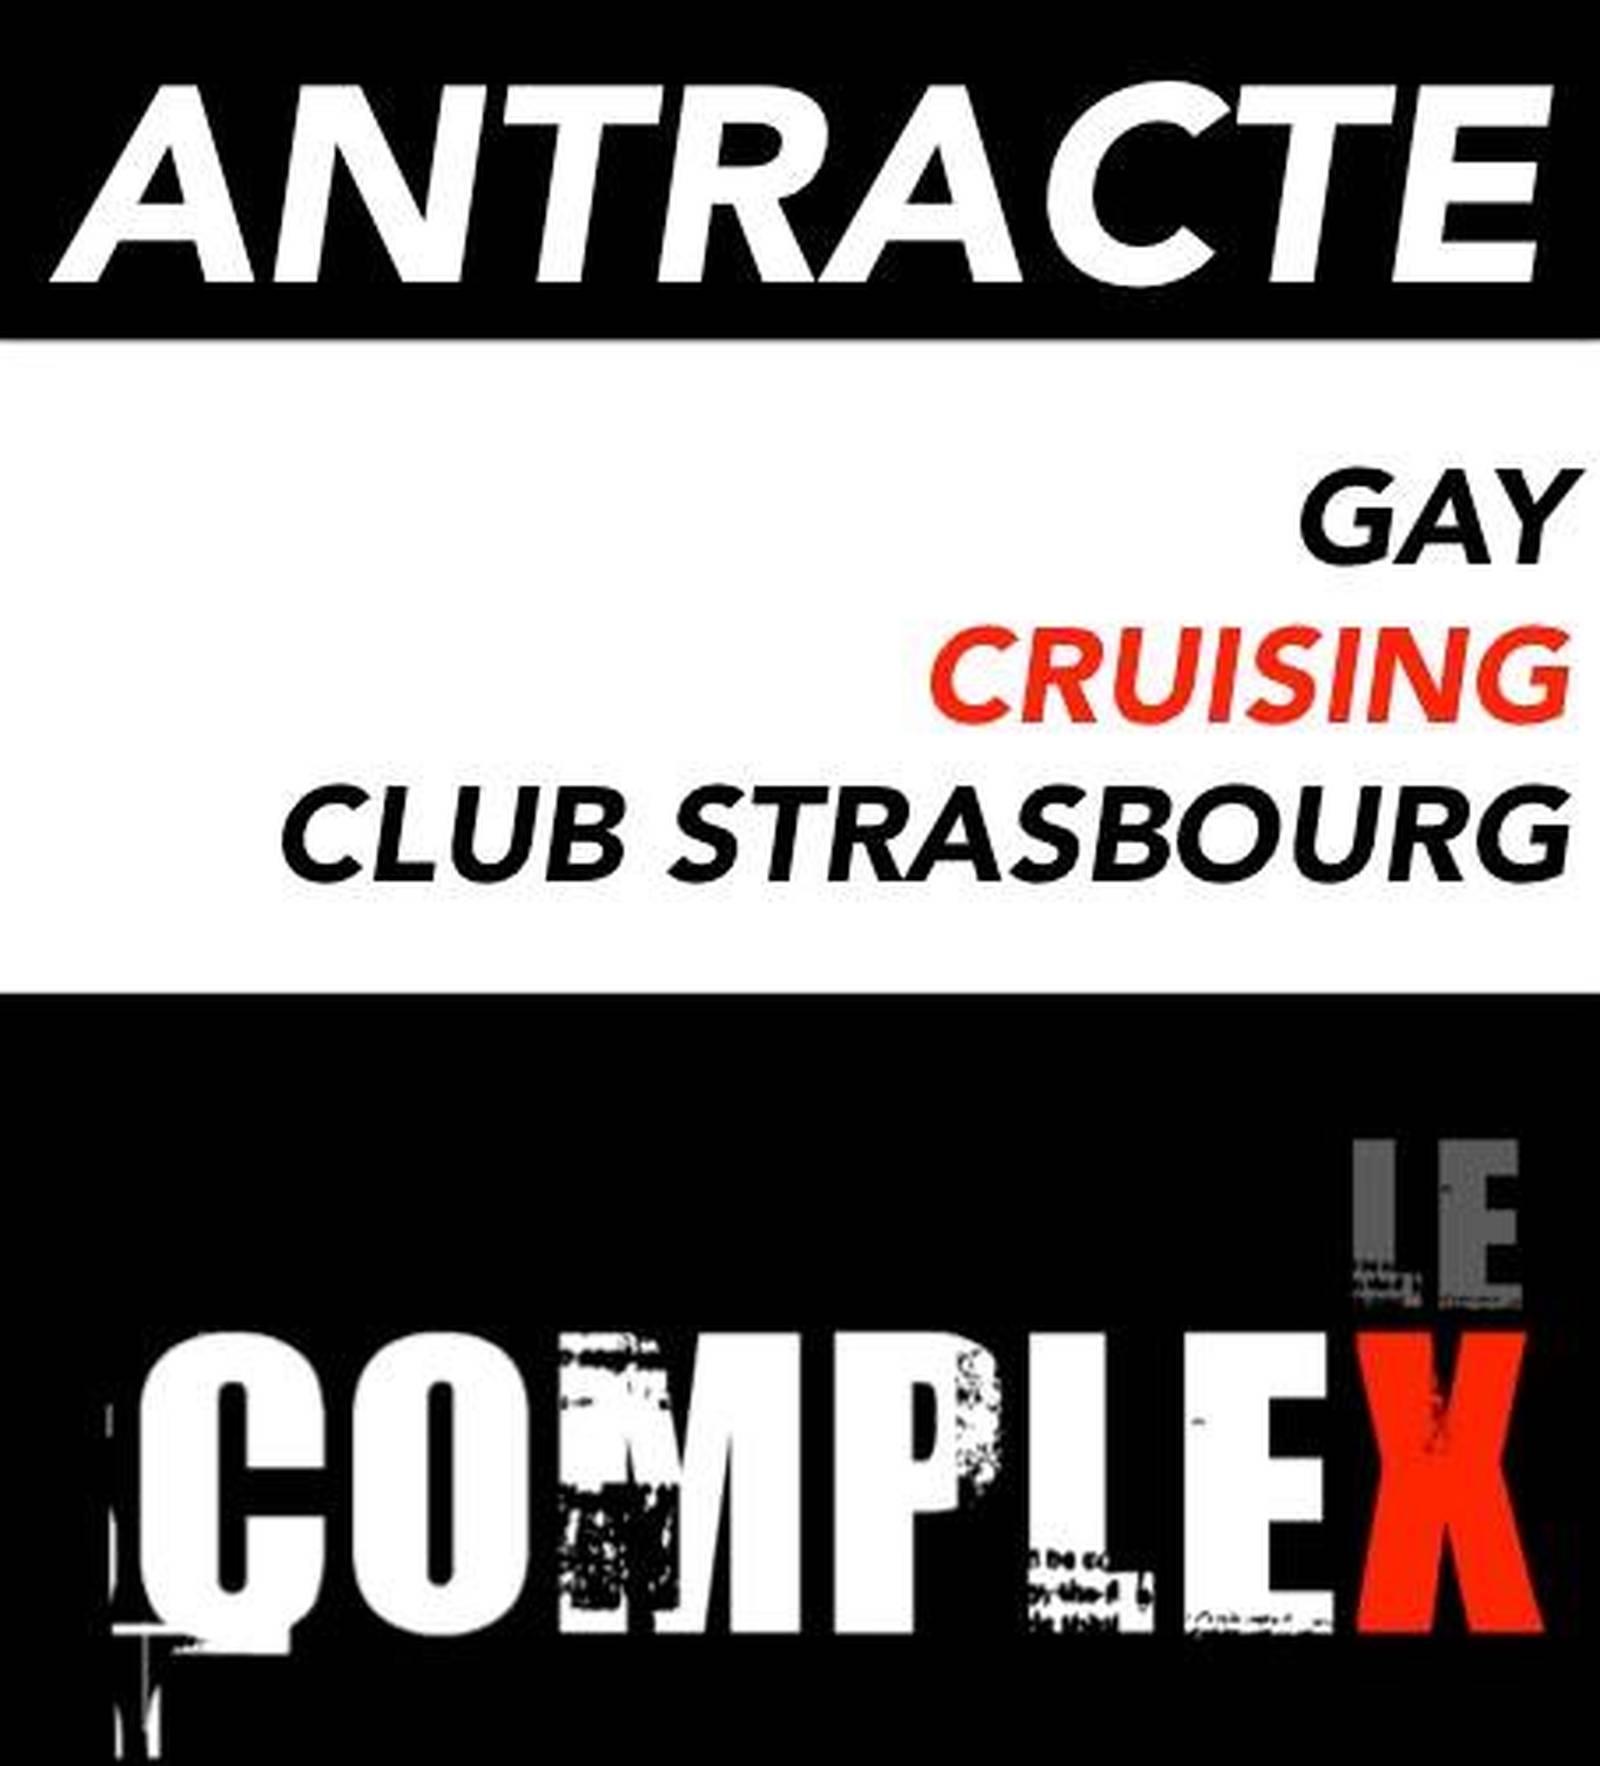 San fran gay